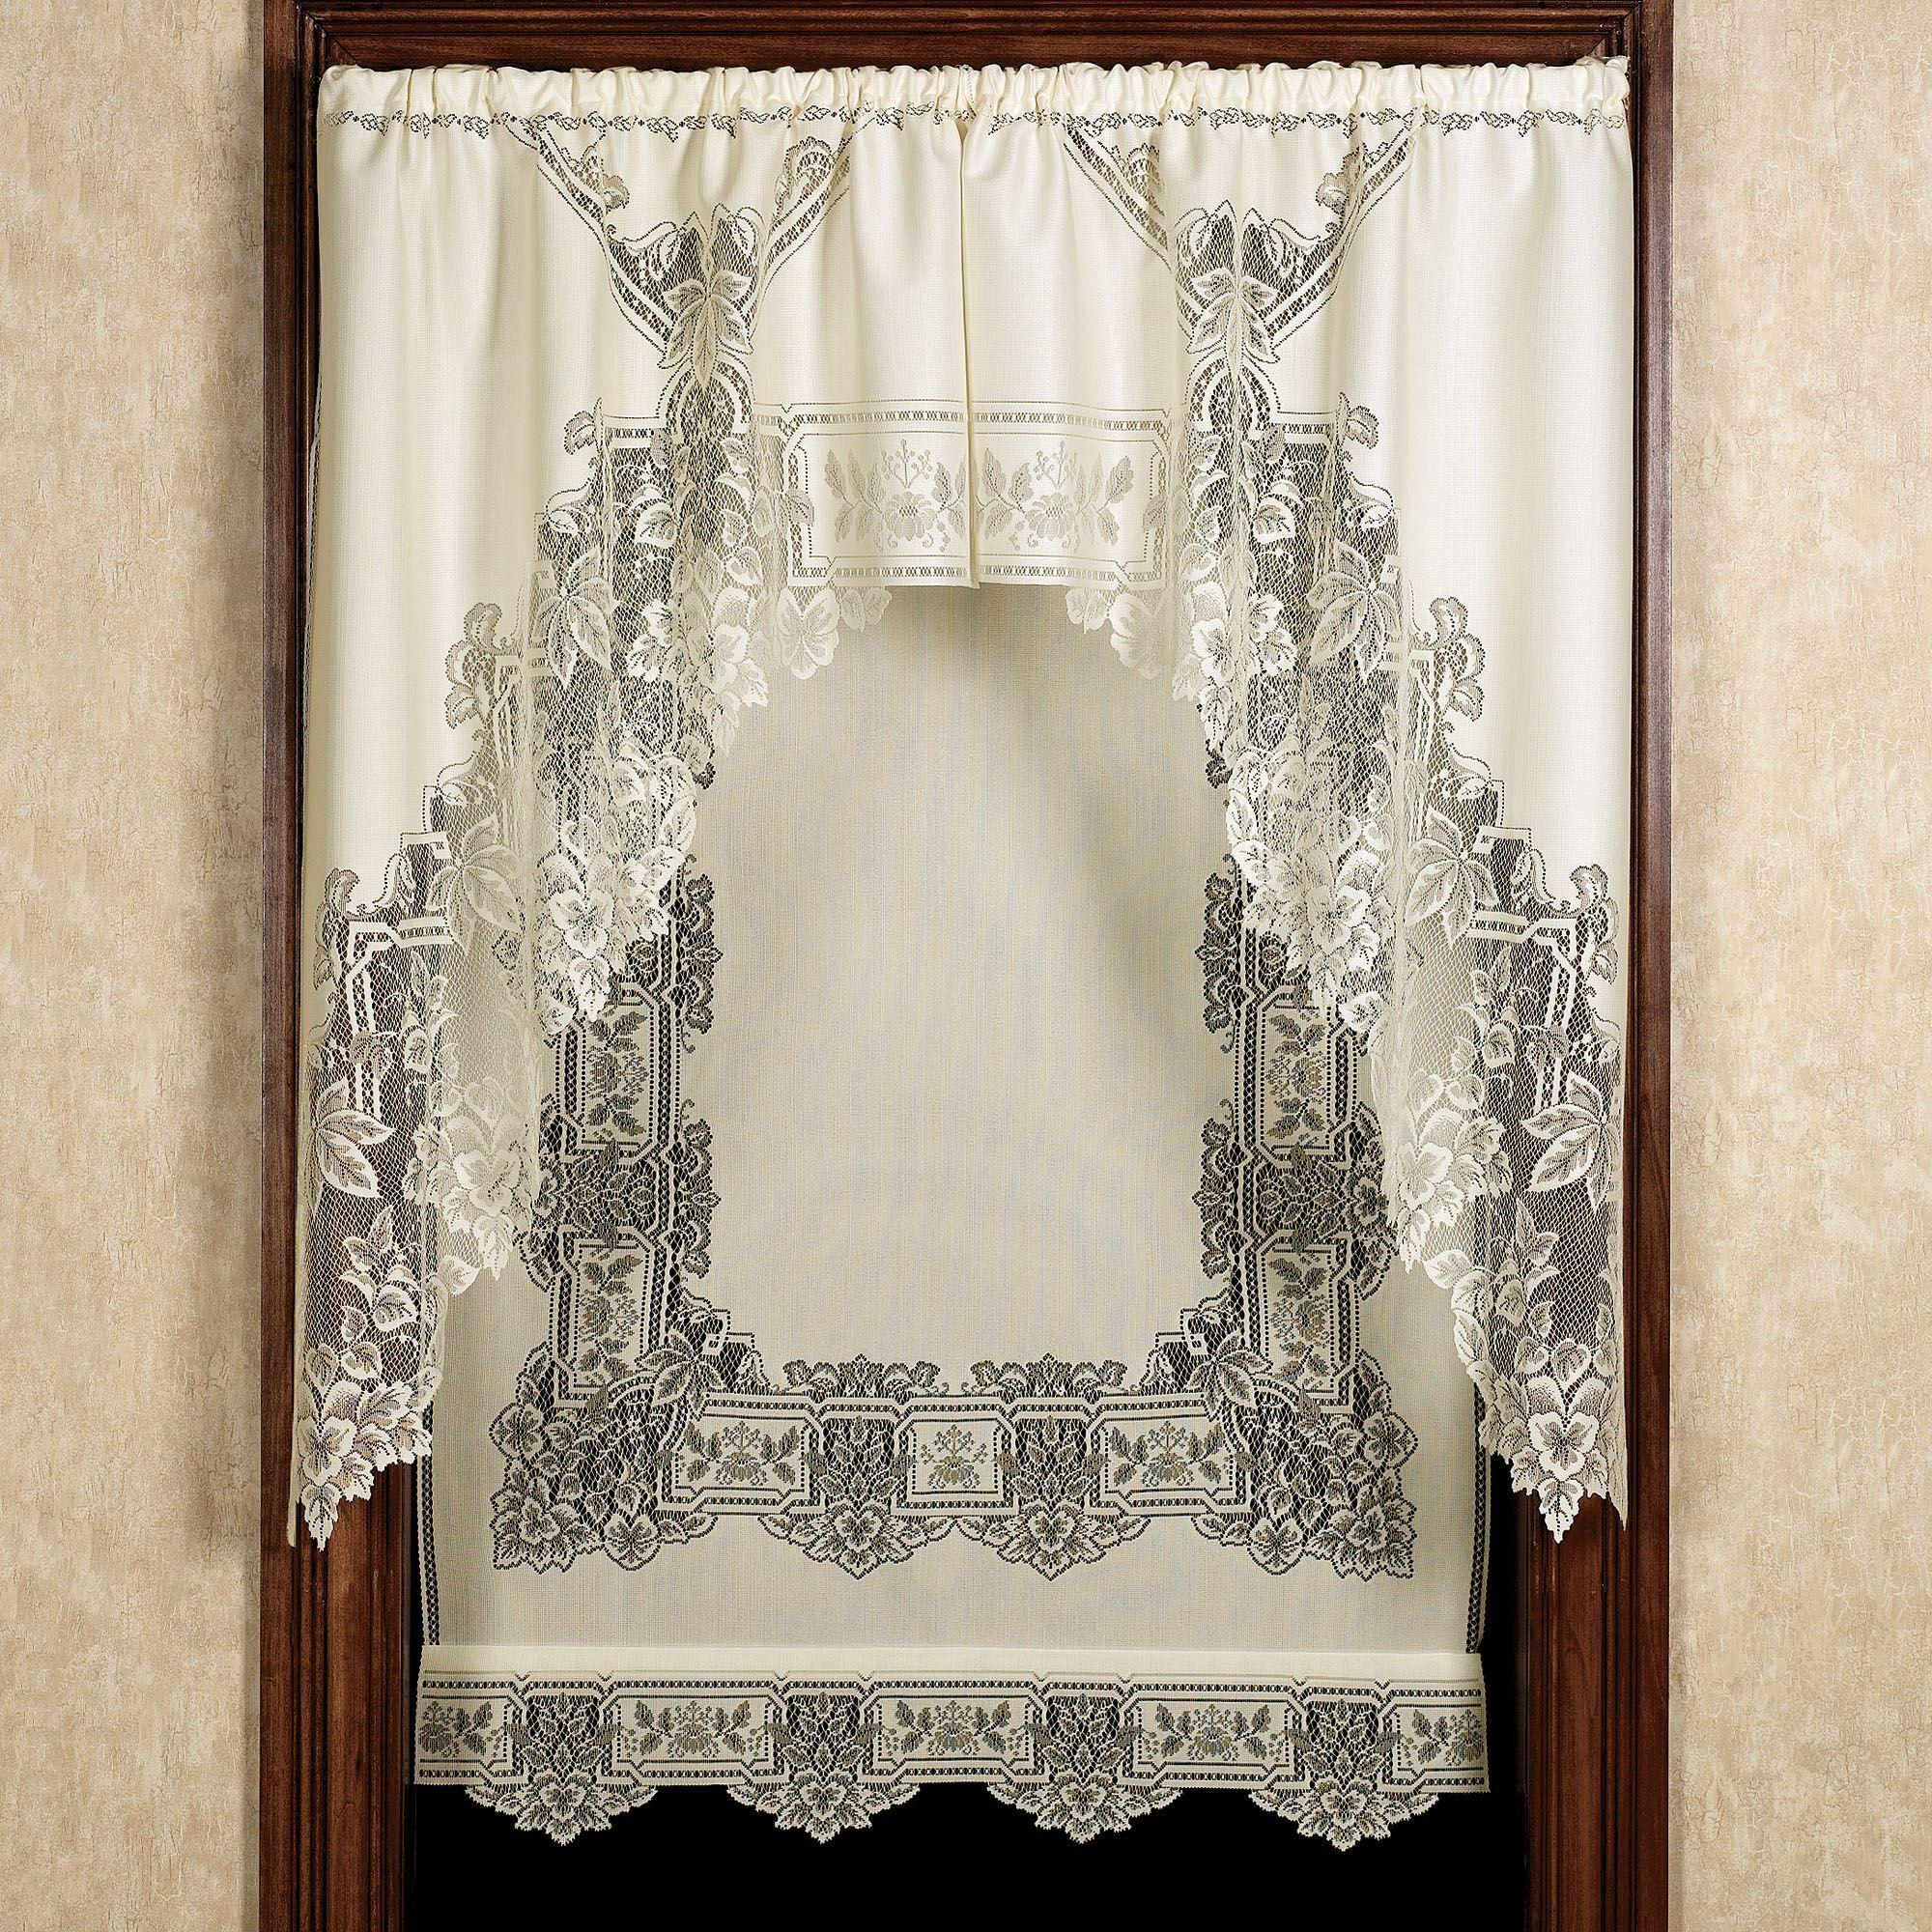 Heirloom Lace Panels Window Treatment